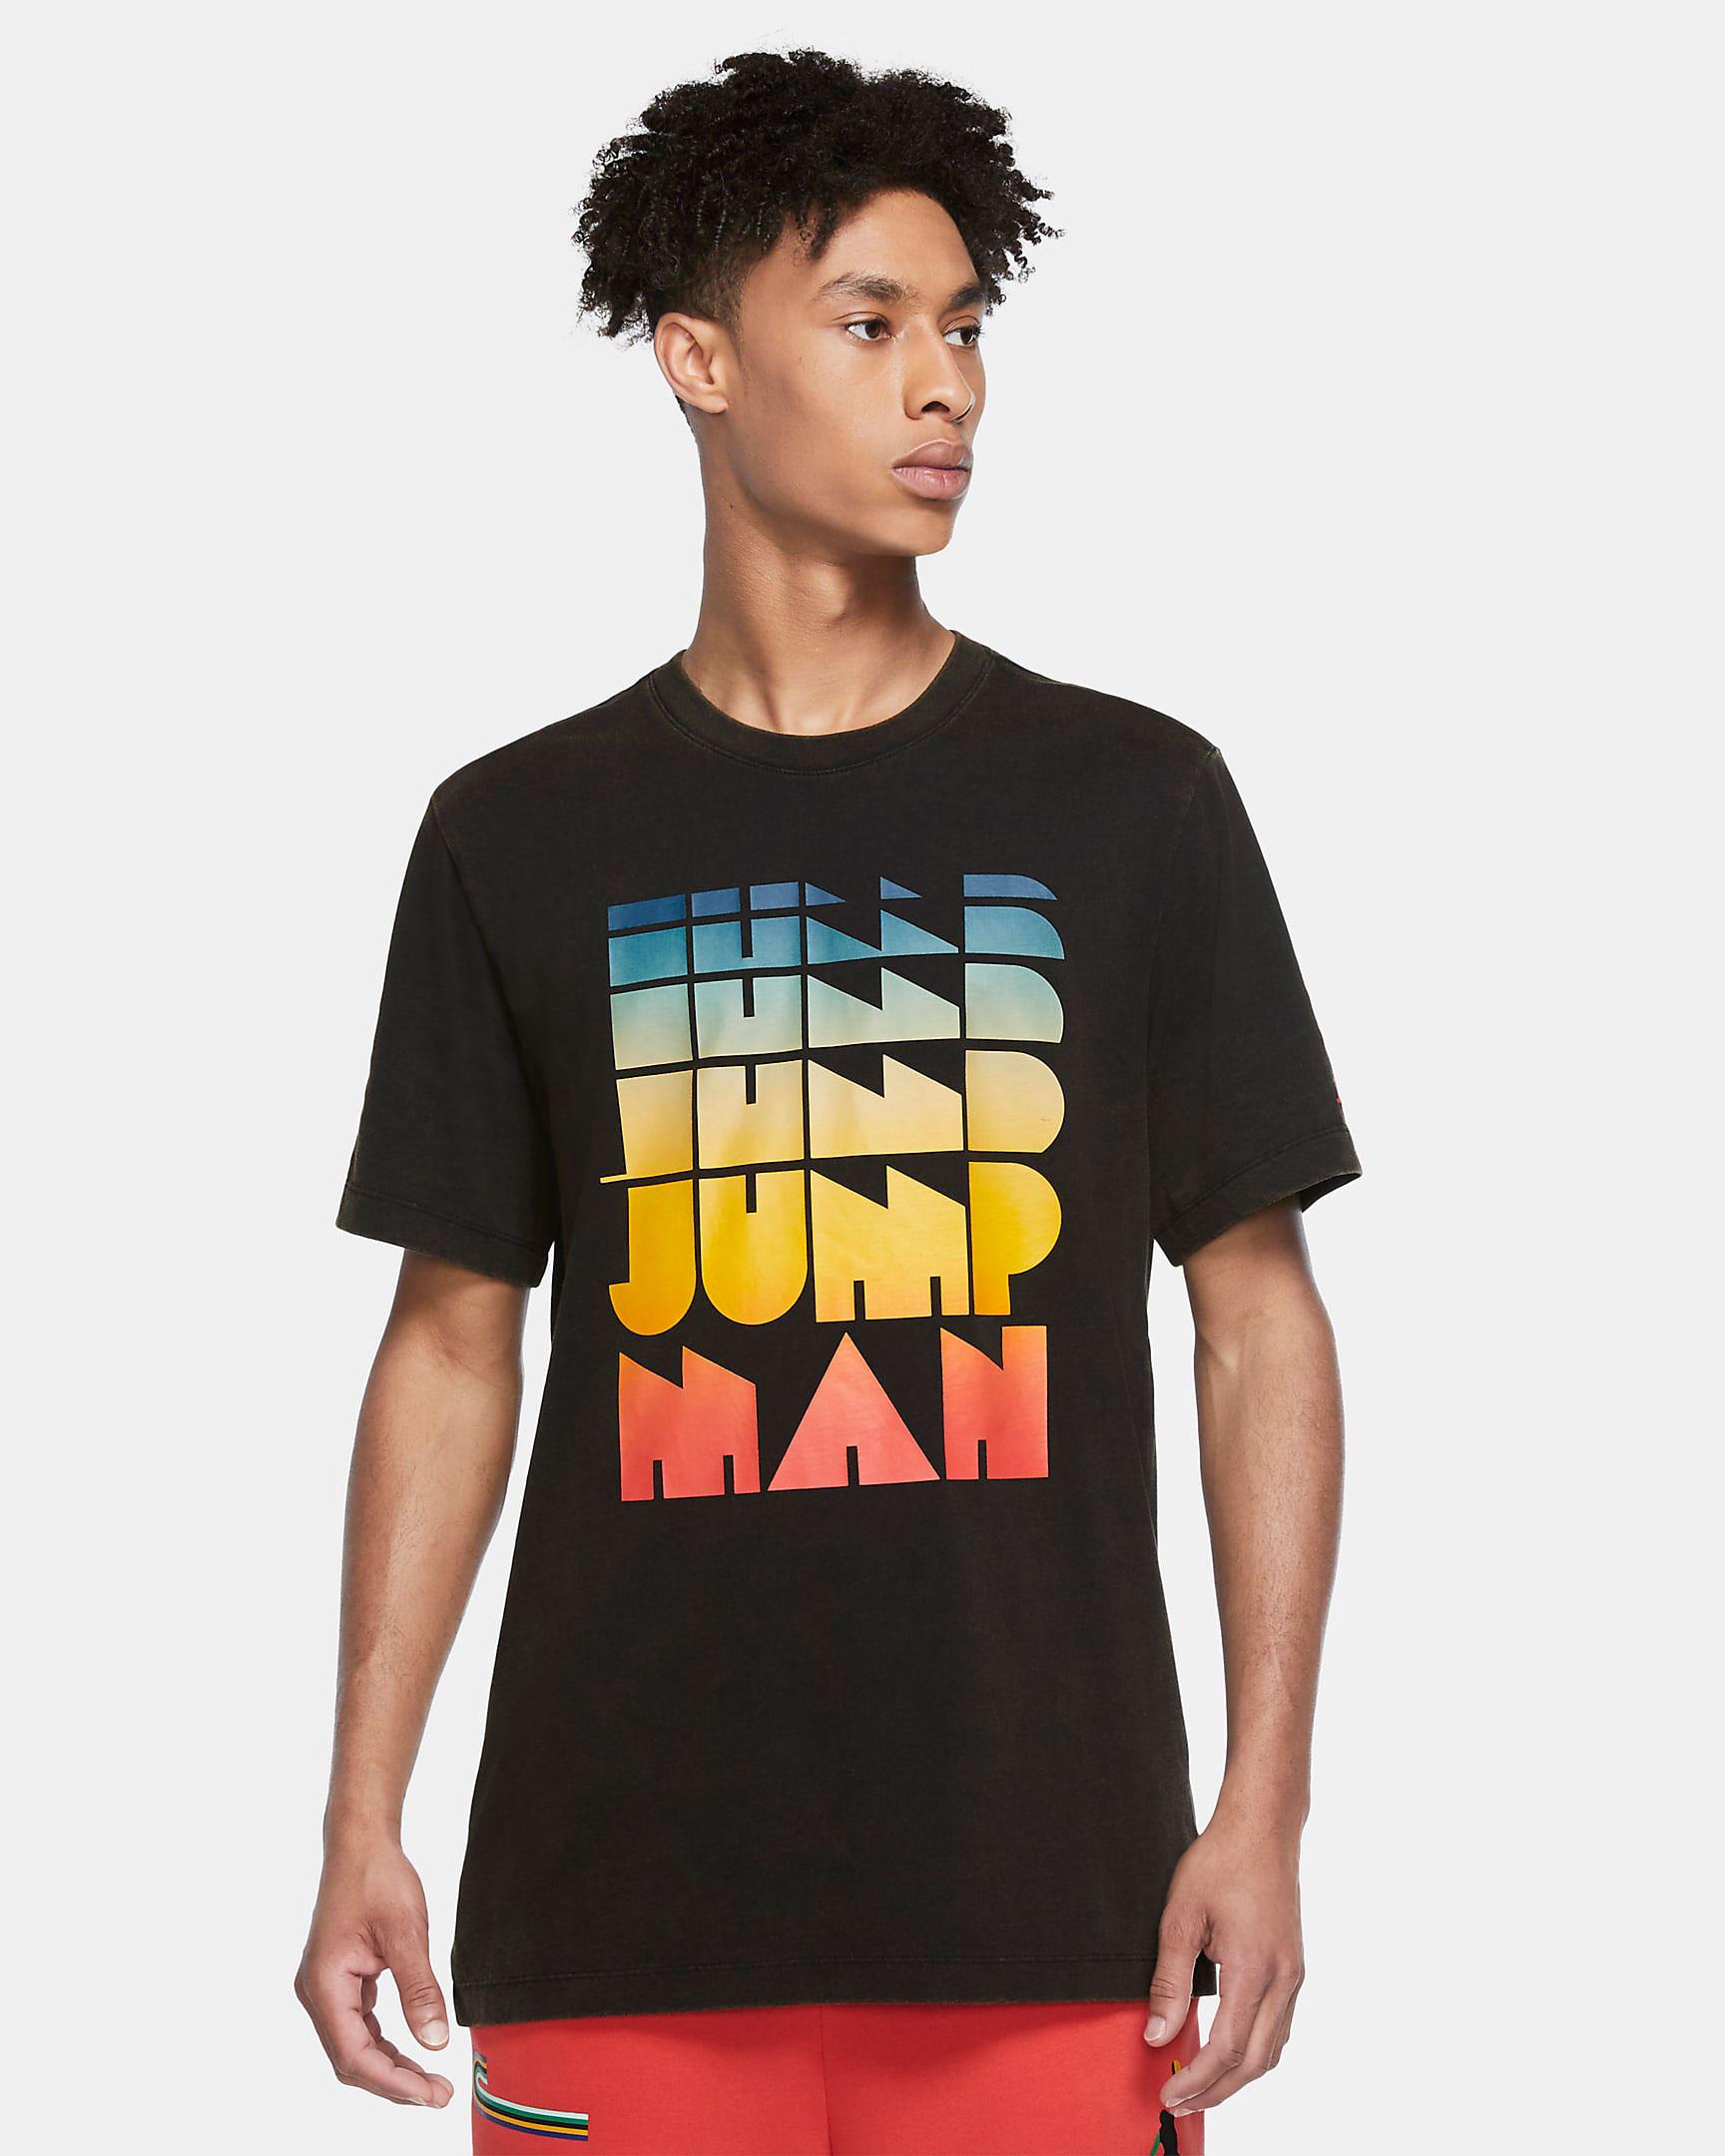 air-jordan-1-bio-hack-shirt-match-1